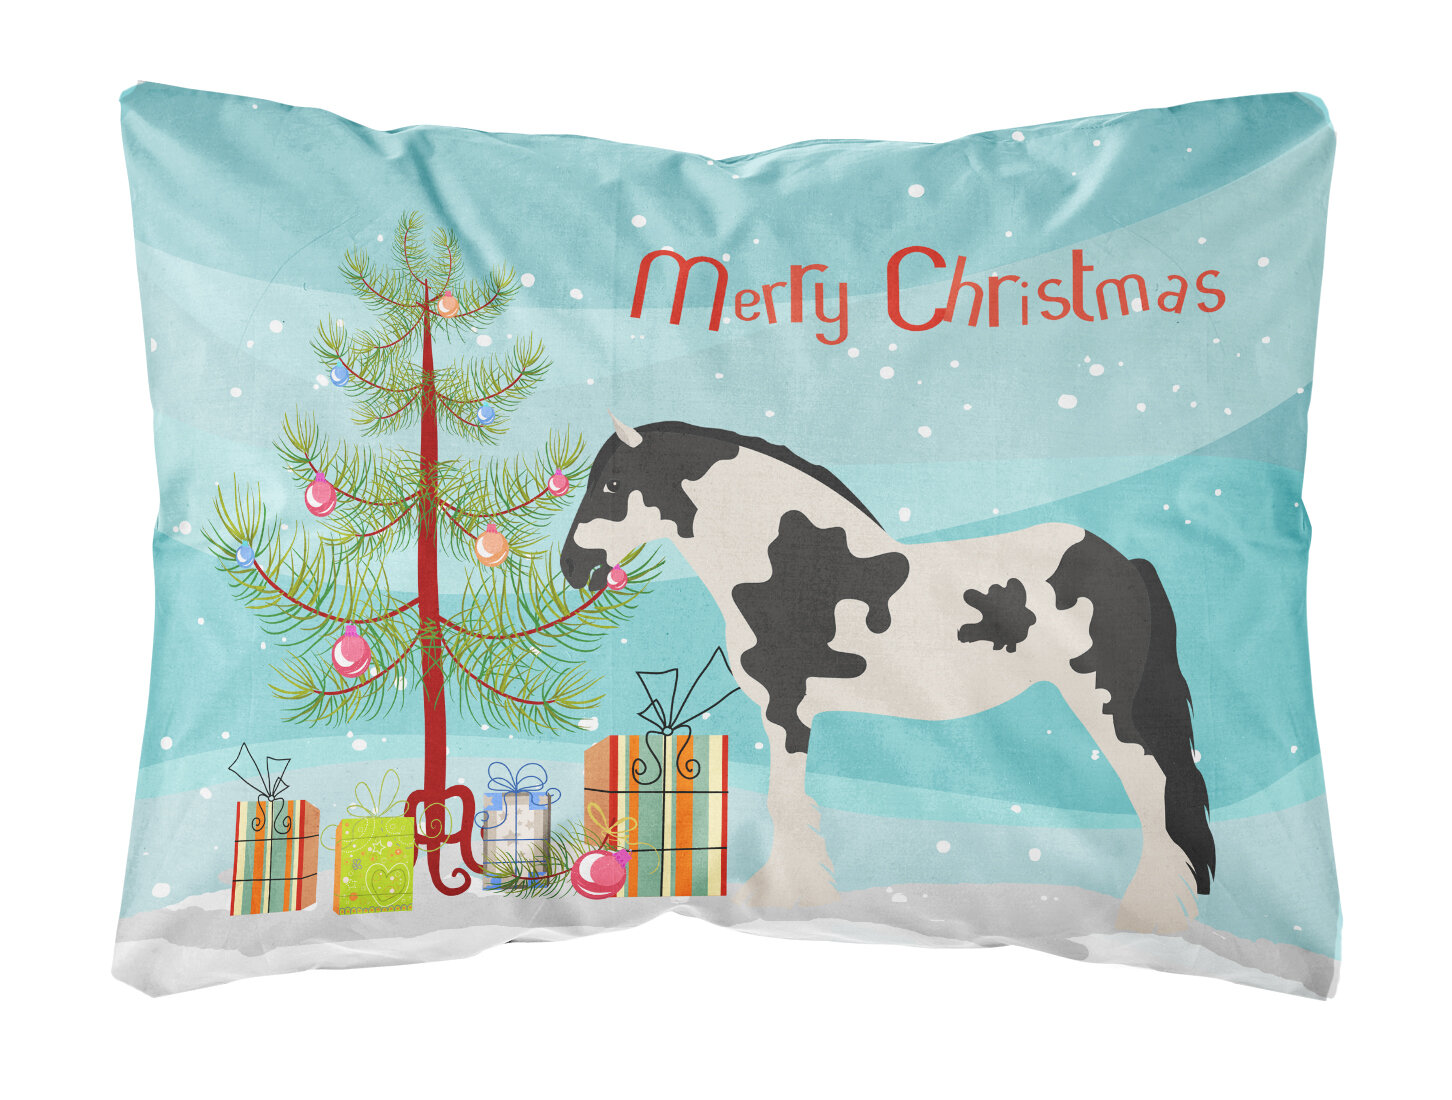 The Holiday Aisle Huntington Clydesdale Horse Christmas Fabric Indoor Outdoor Throw Pillow Wayfair